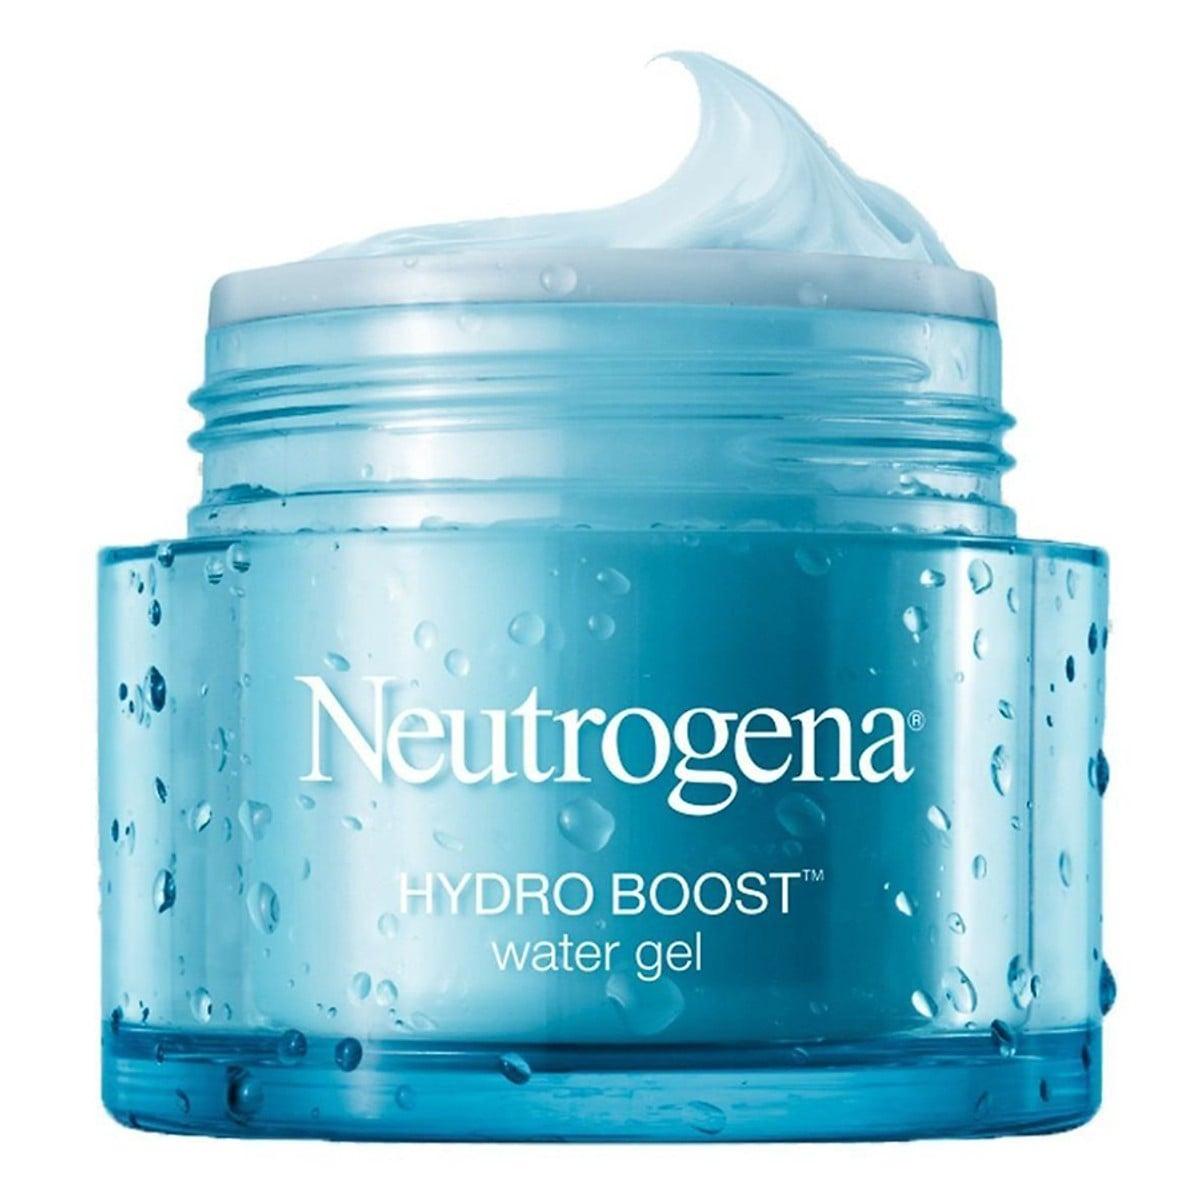 Neutrogena Hydro Boost Gel Cream For Extra-Dry Skin